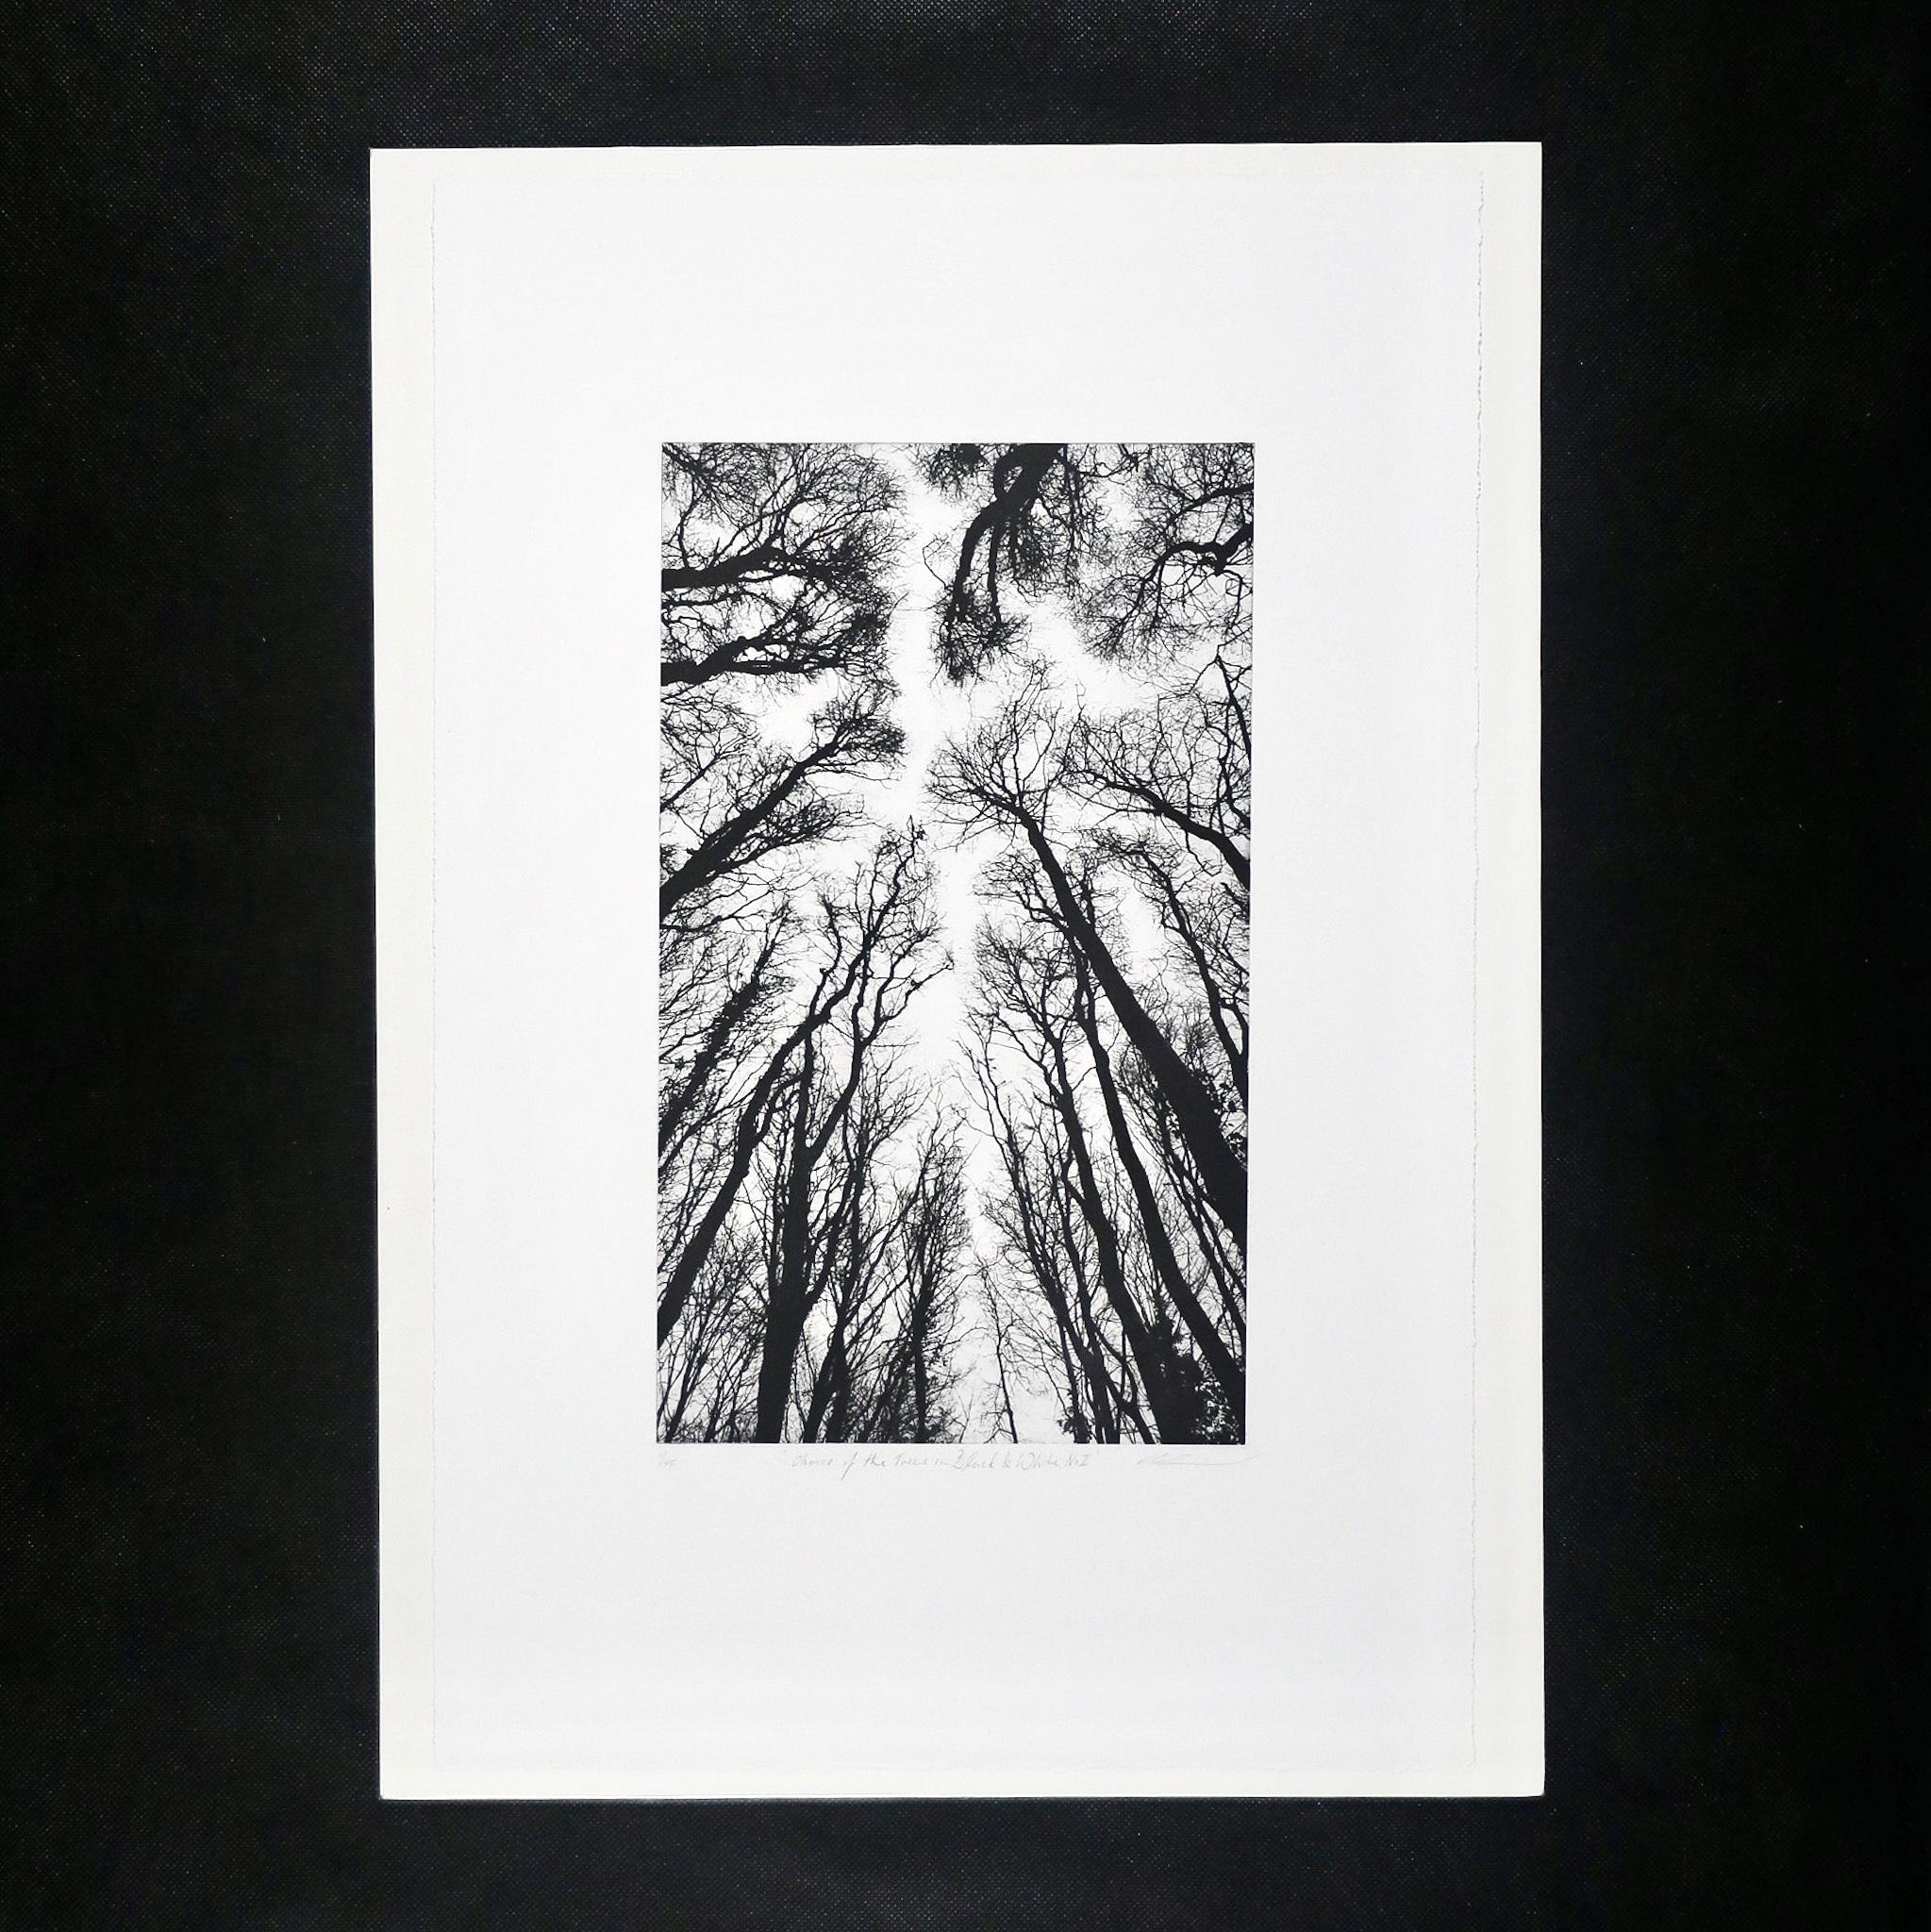 056FAD0E 858D 44A1 8CC9 7BA30D030A84 - Chorus of the Trees in Black & White, No II by Clare Grossman